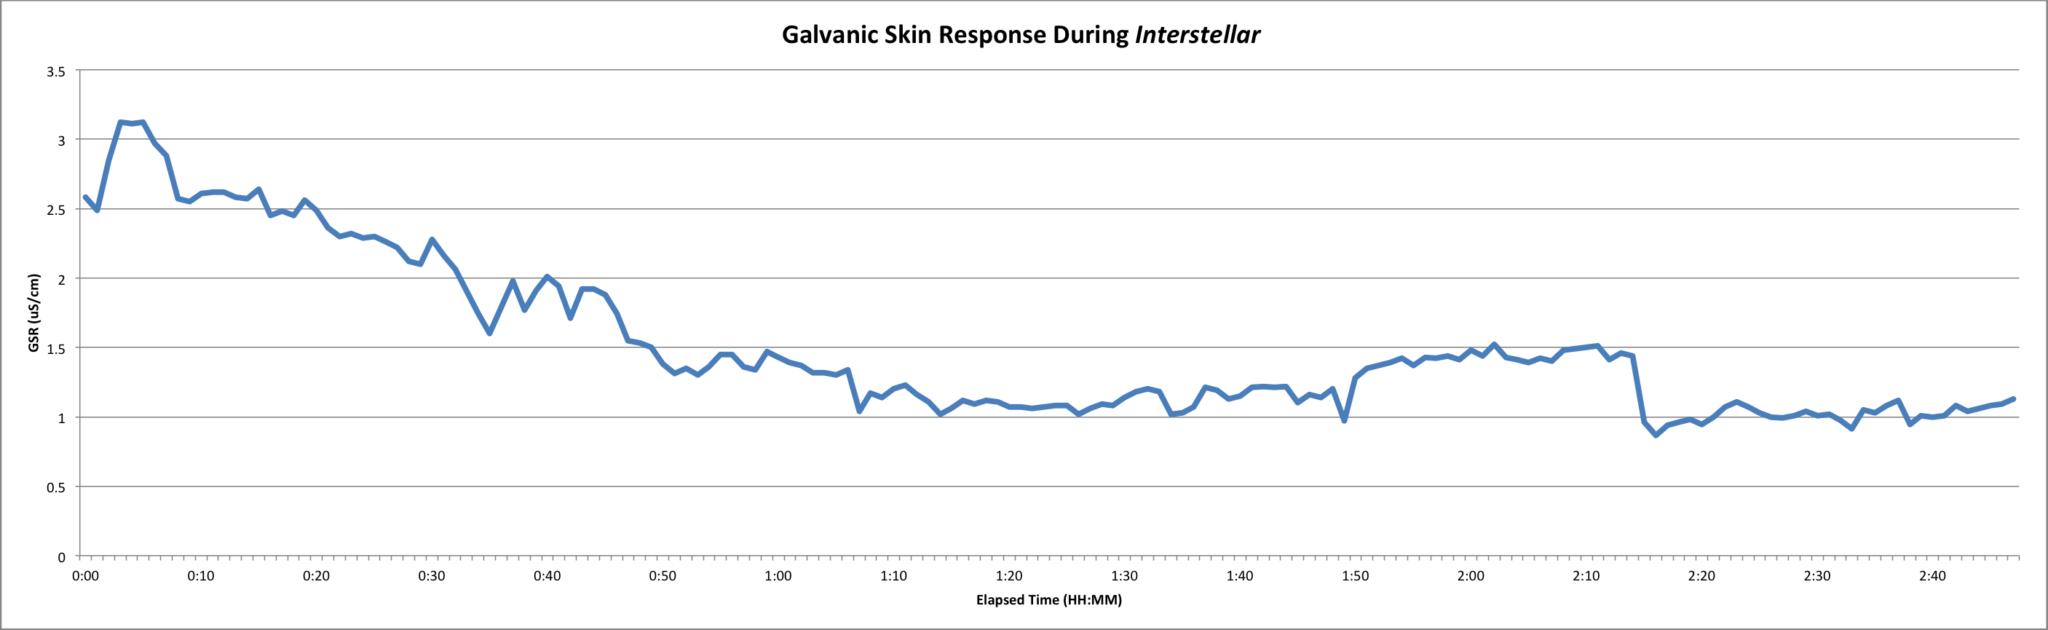 Galvanic skin response (GSR) during Interstellar